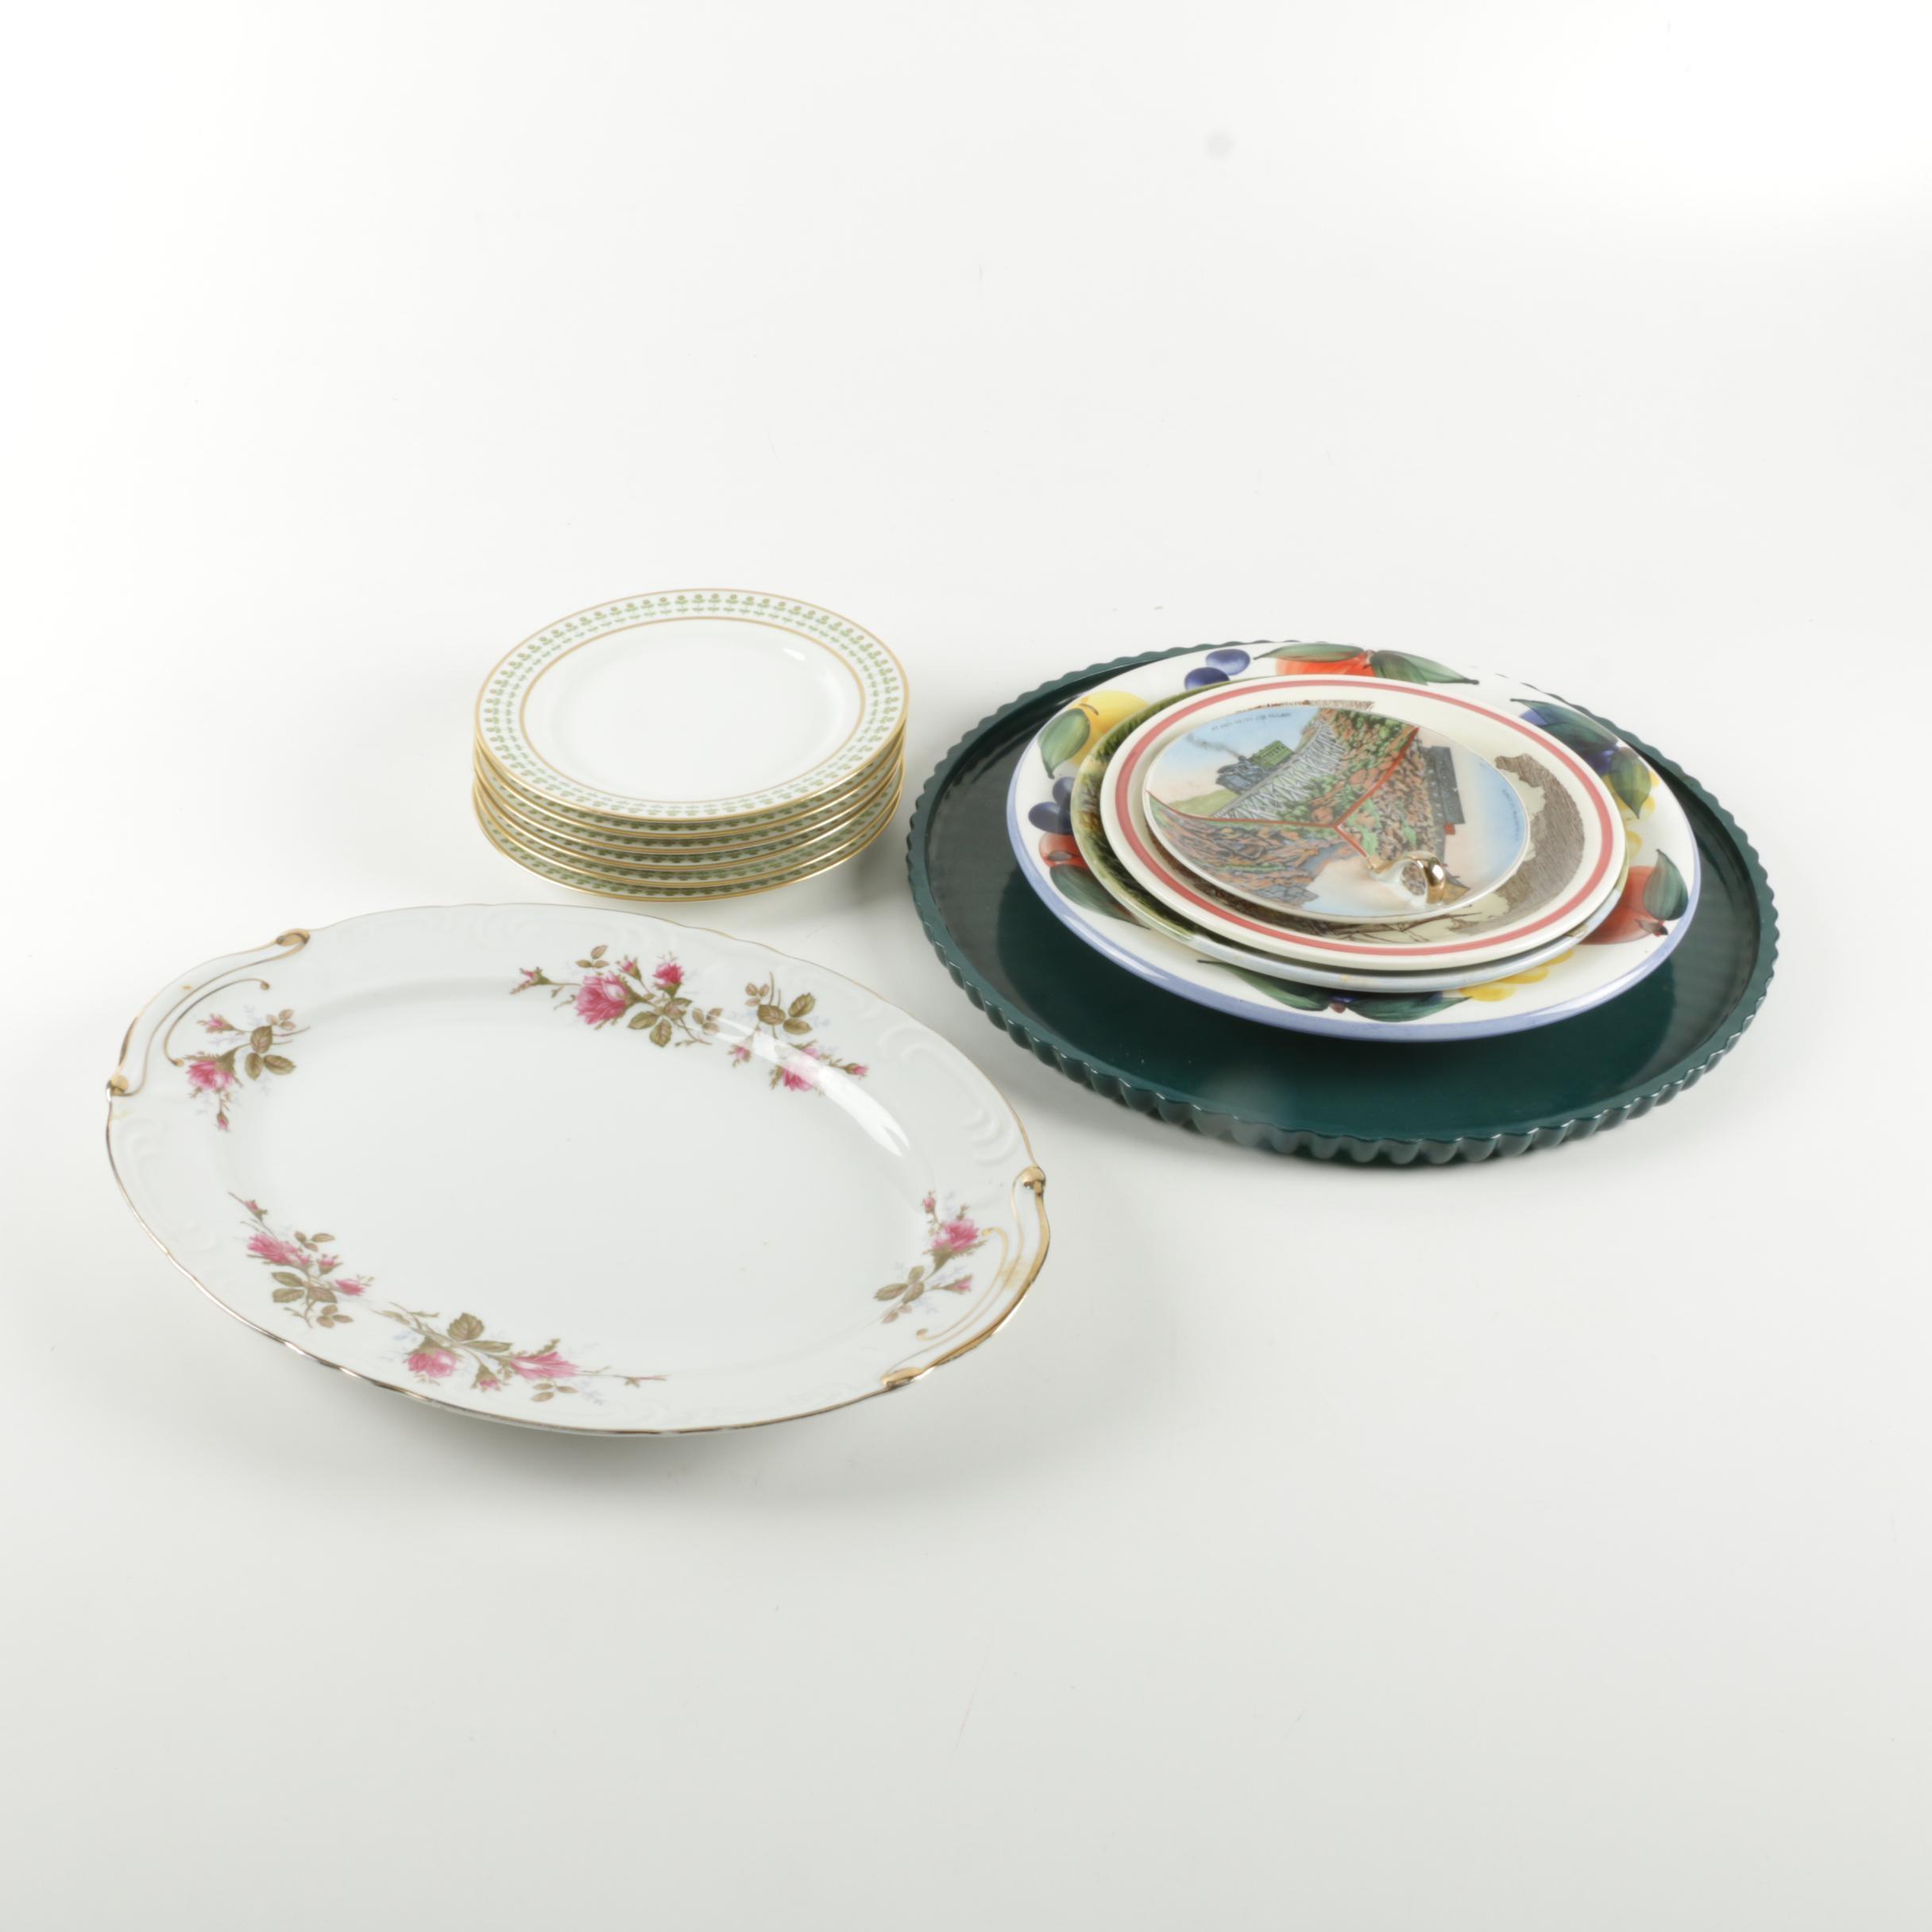 Tableware Featuring Dansk and Charles Field Haviland